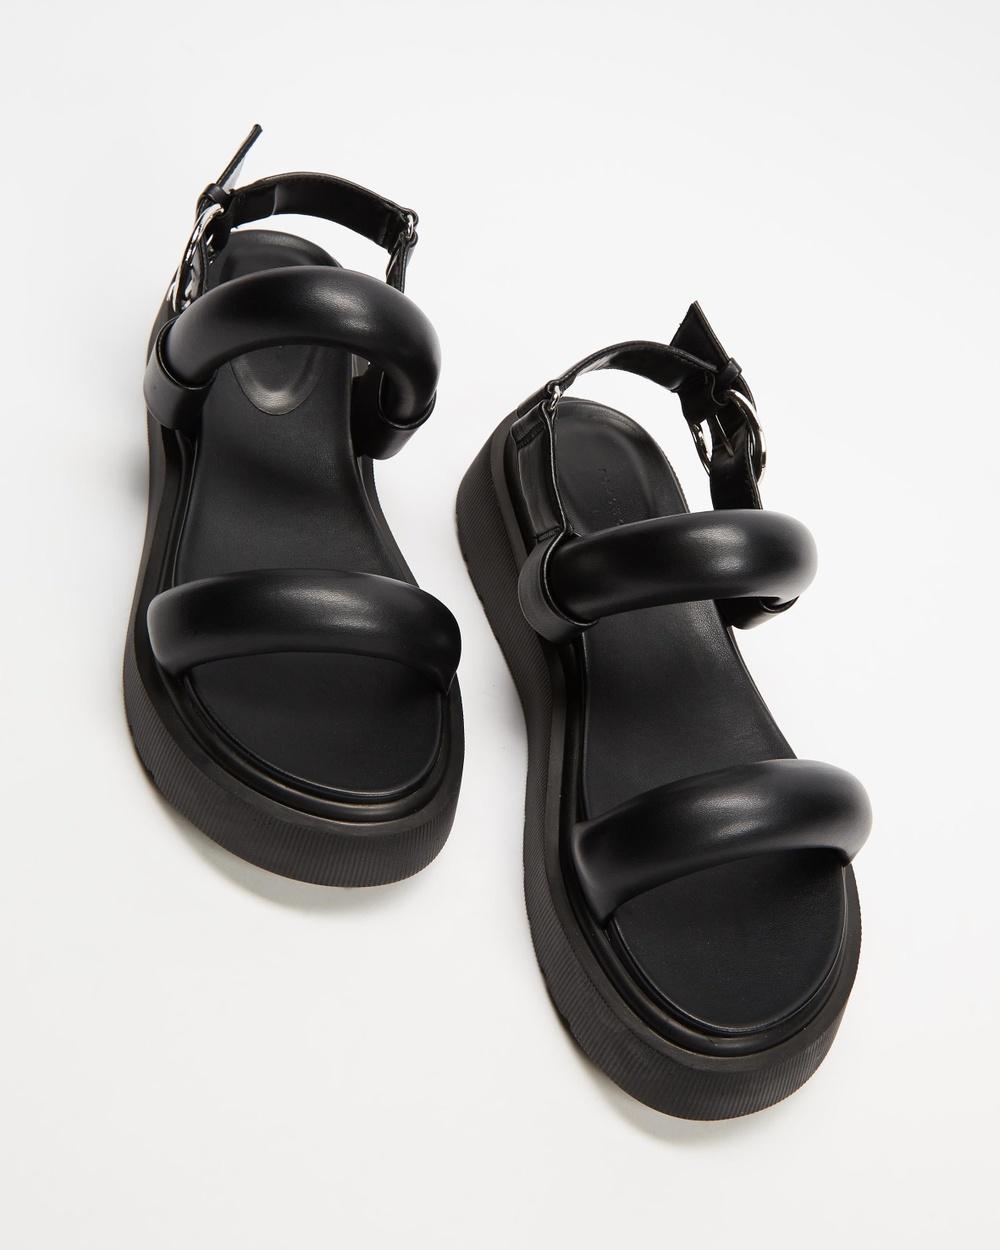 TOPSHOP Int Pacha Sandals Black Australia